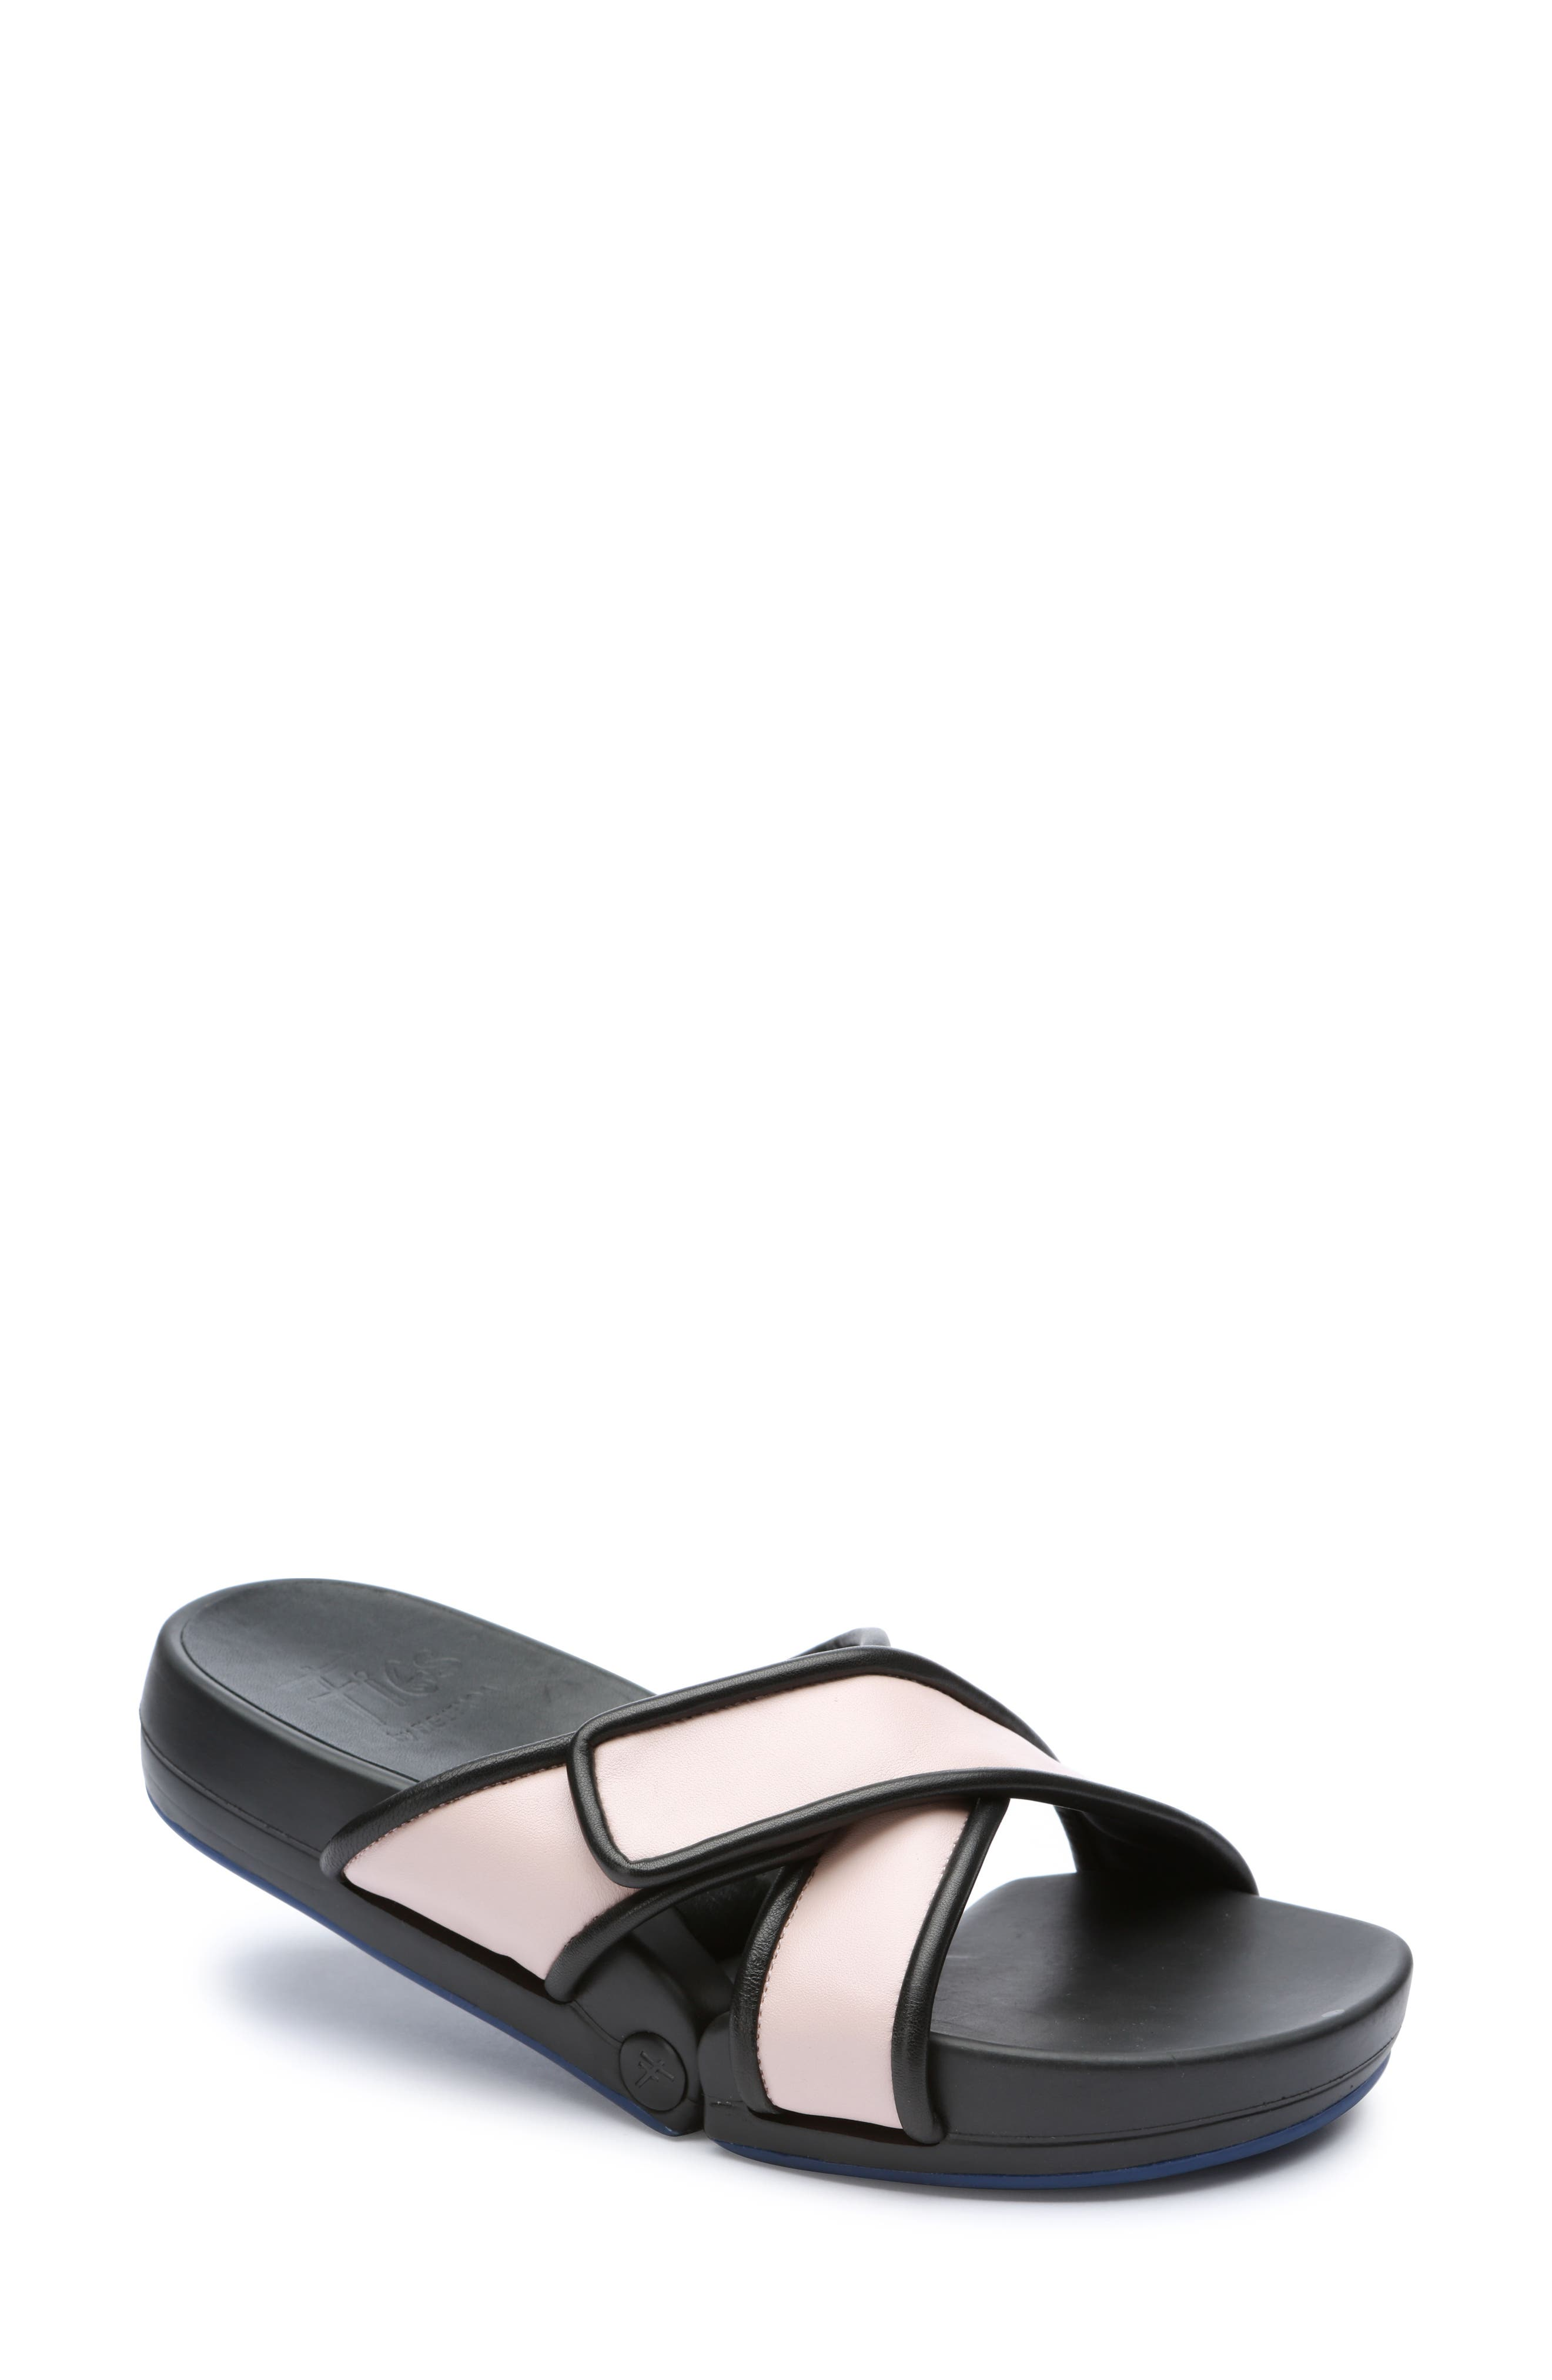 Figomatic Slide Sandal,                             Main thumbnail 1, color,                             Pink Nappa Leather